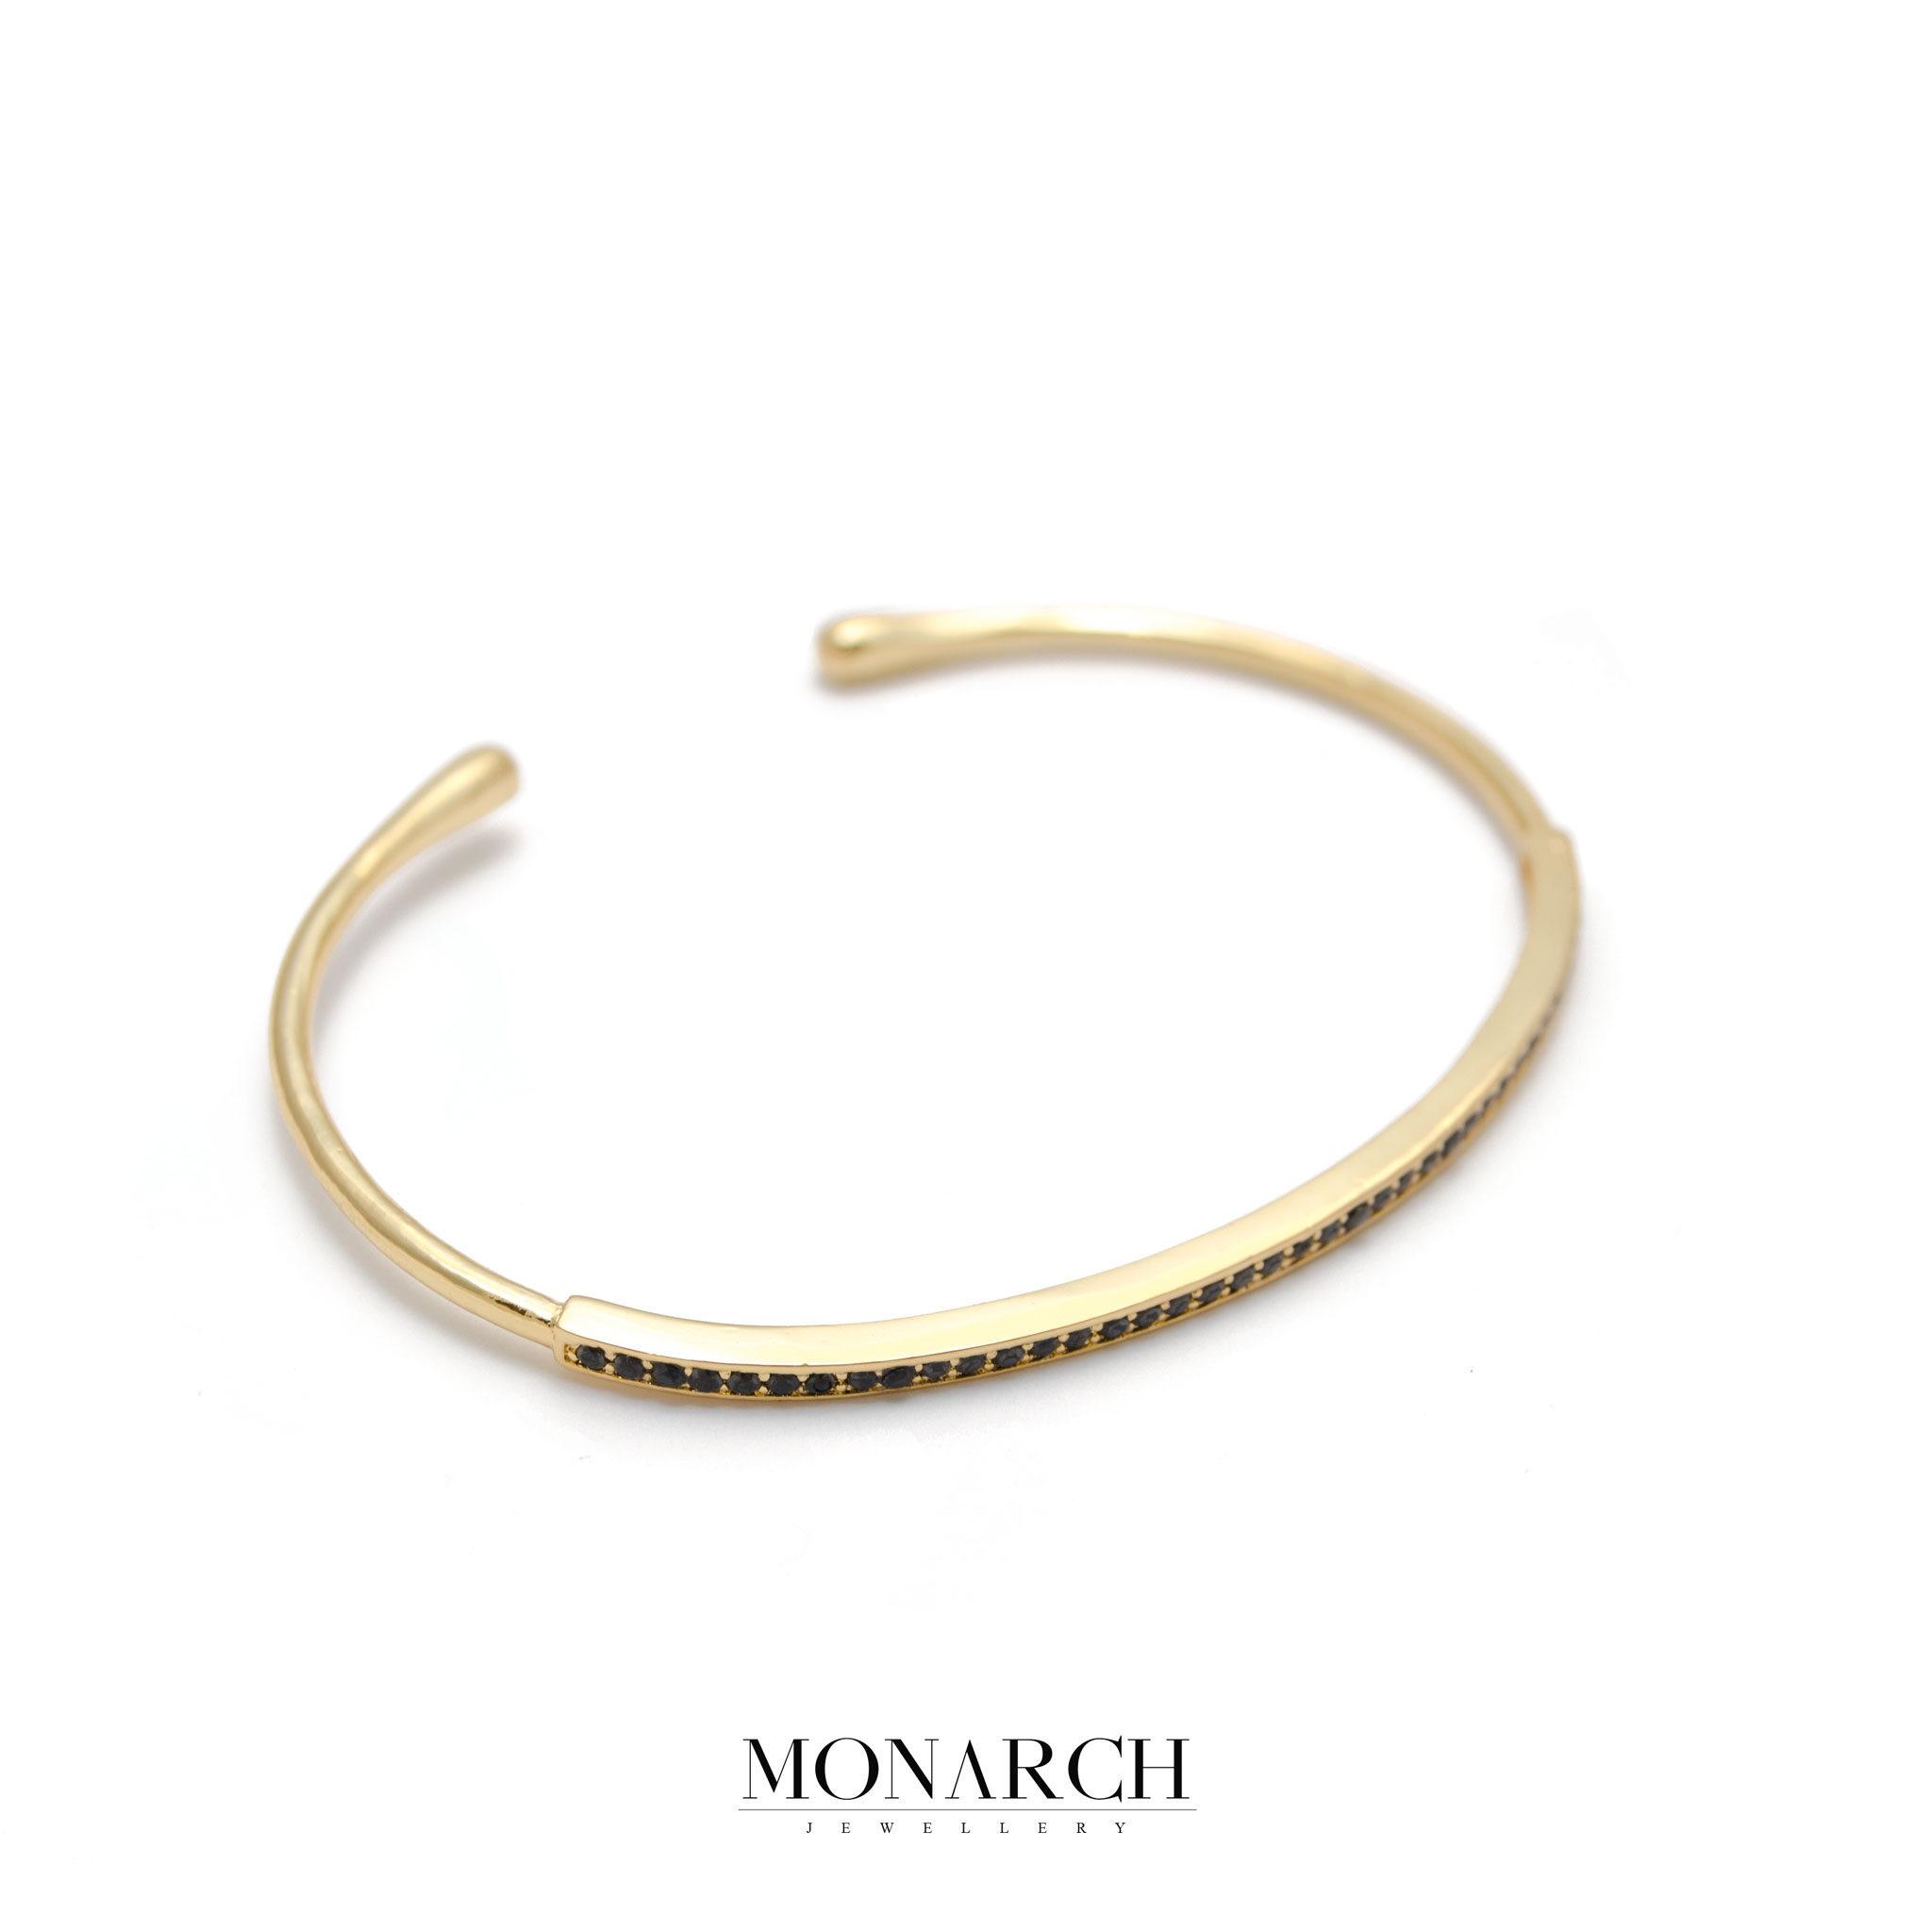 Monarch Jewellery 24k Gold Zircon Slim Bangle Bracelet